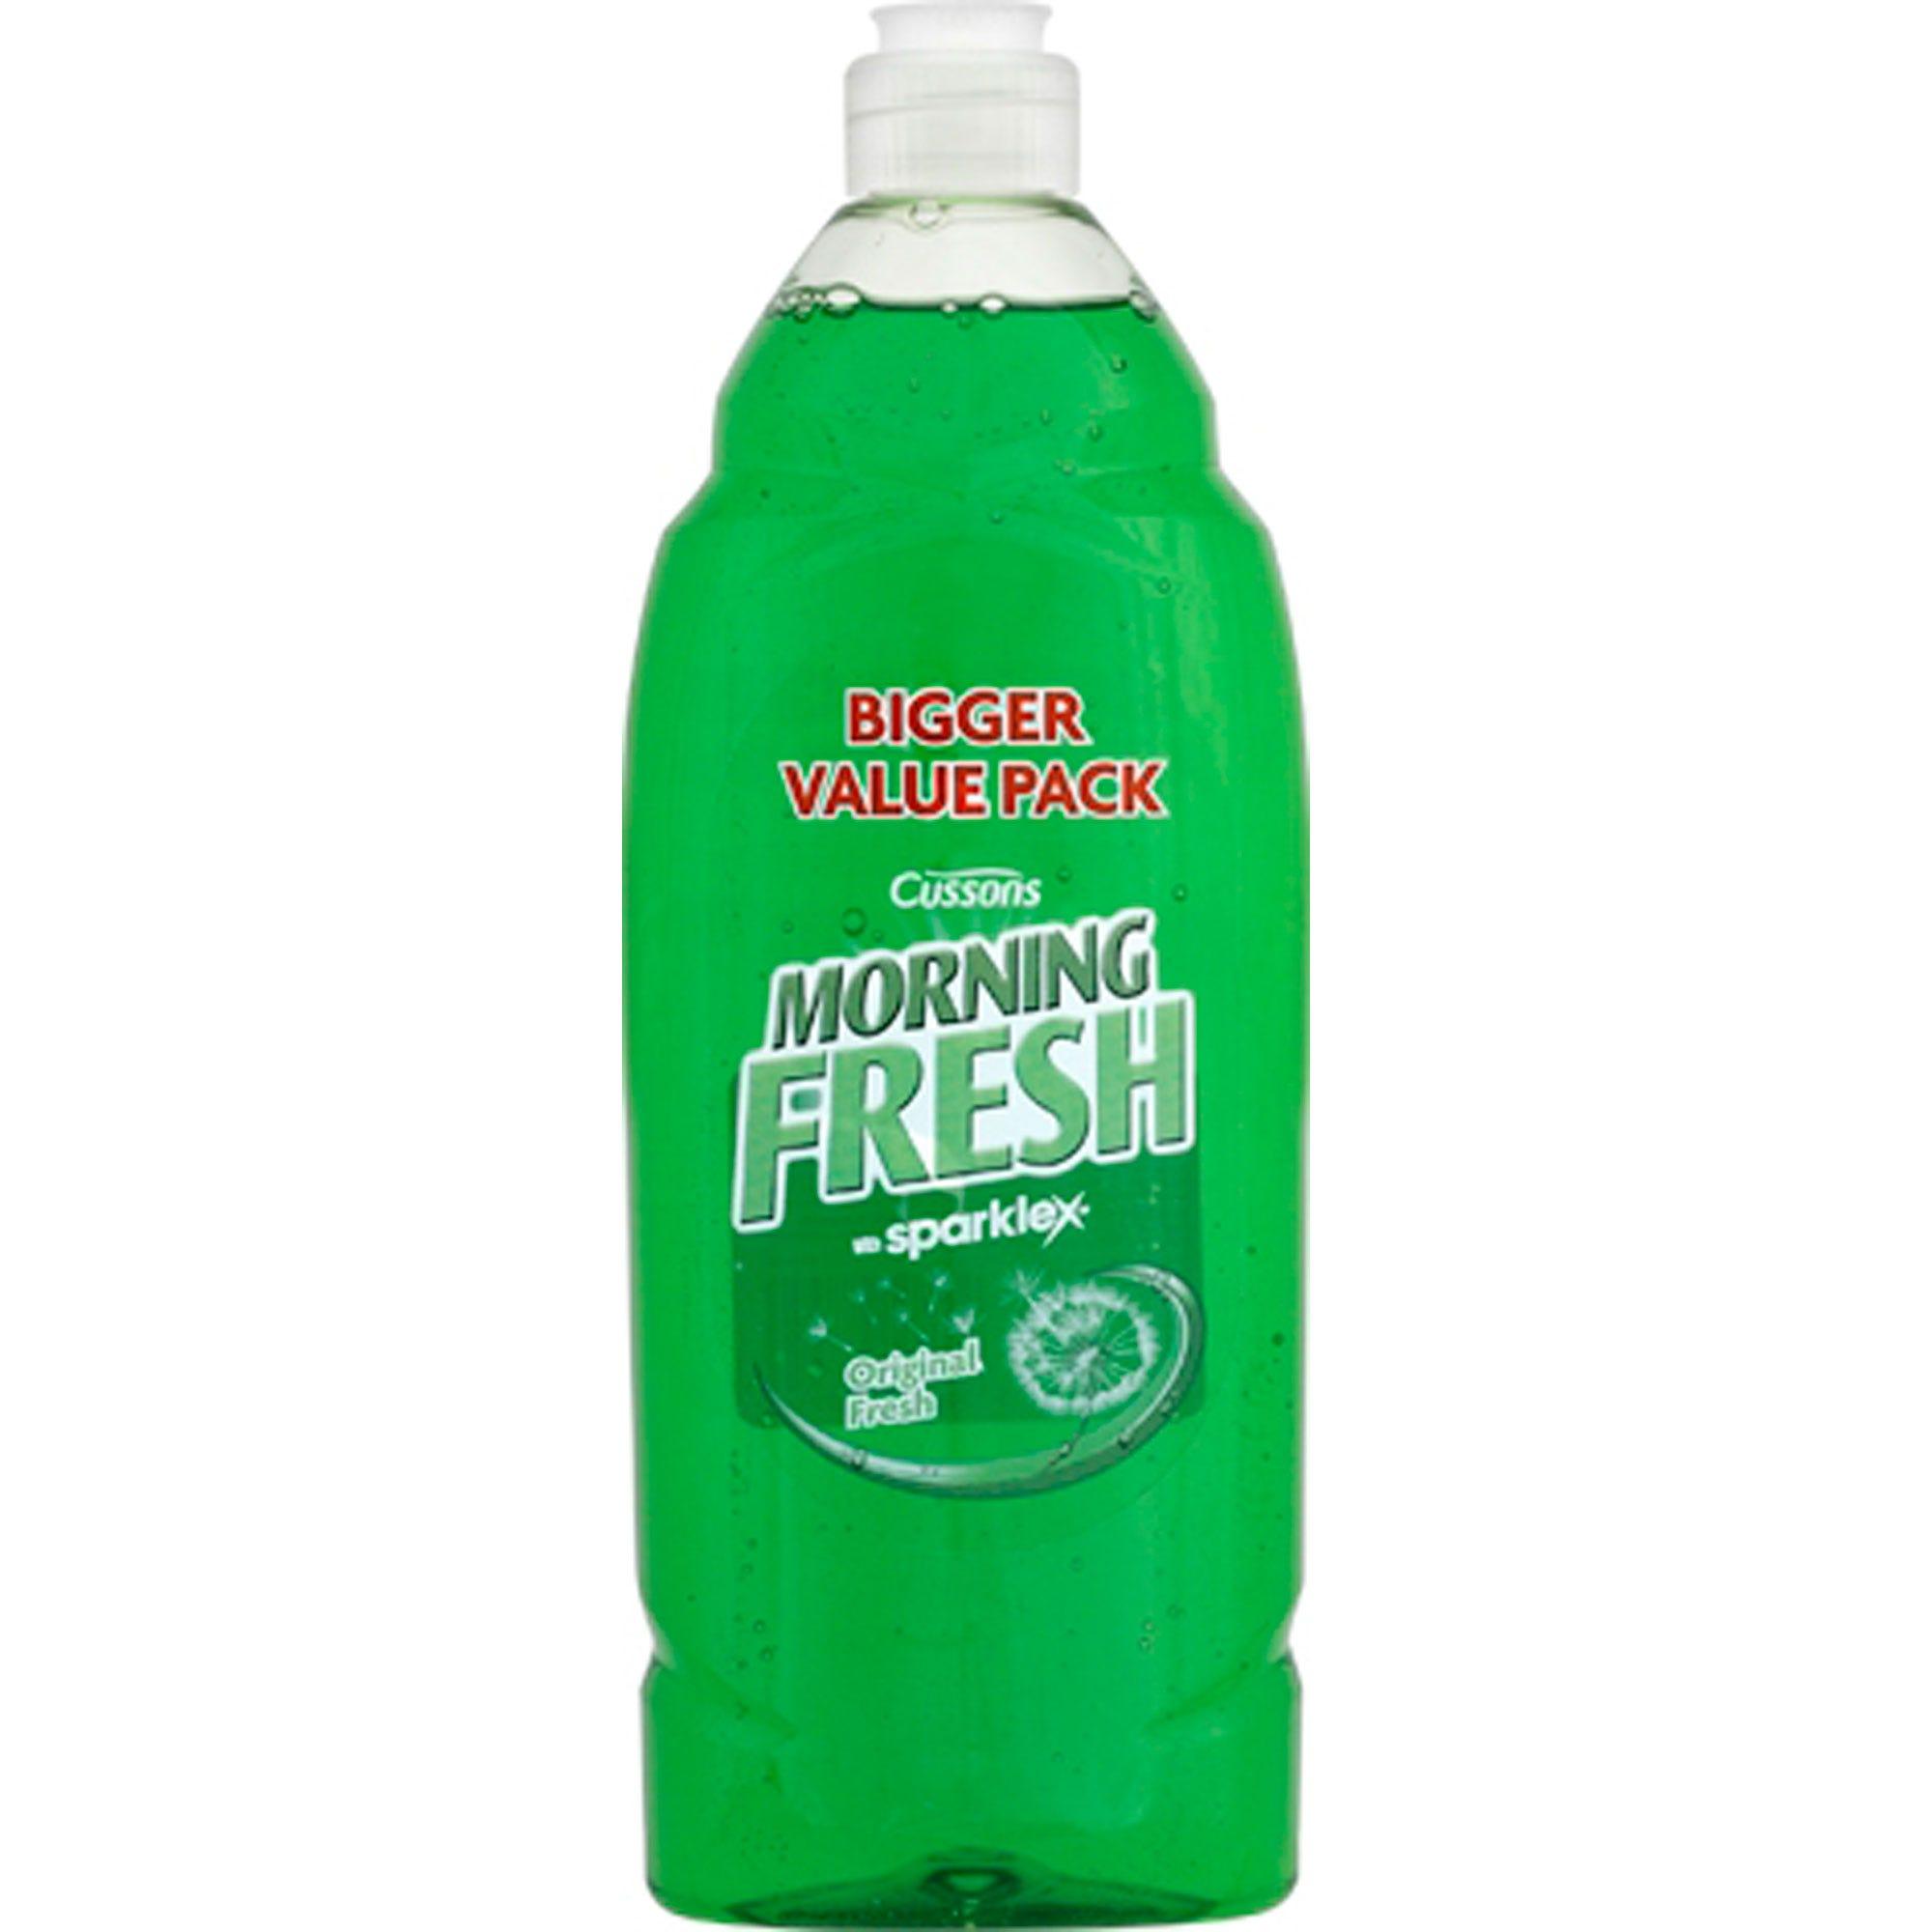 Image of Morning Fresh Original Washing Up Liquid 675ml